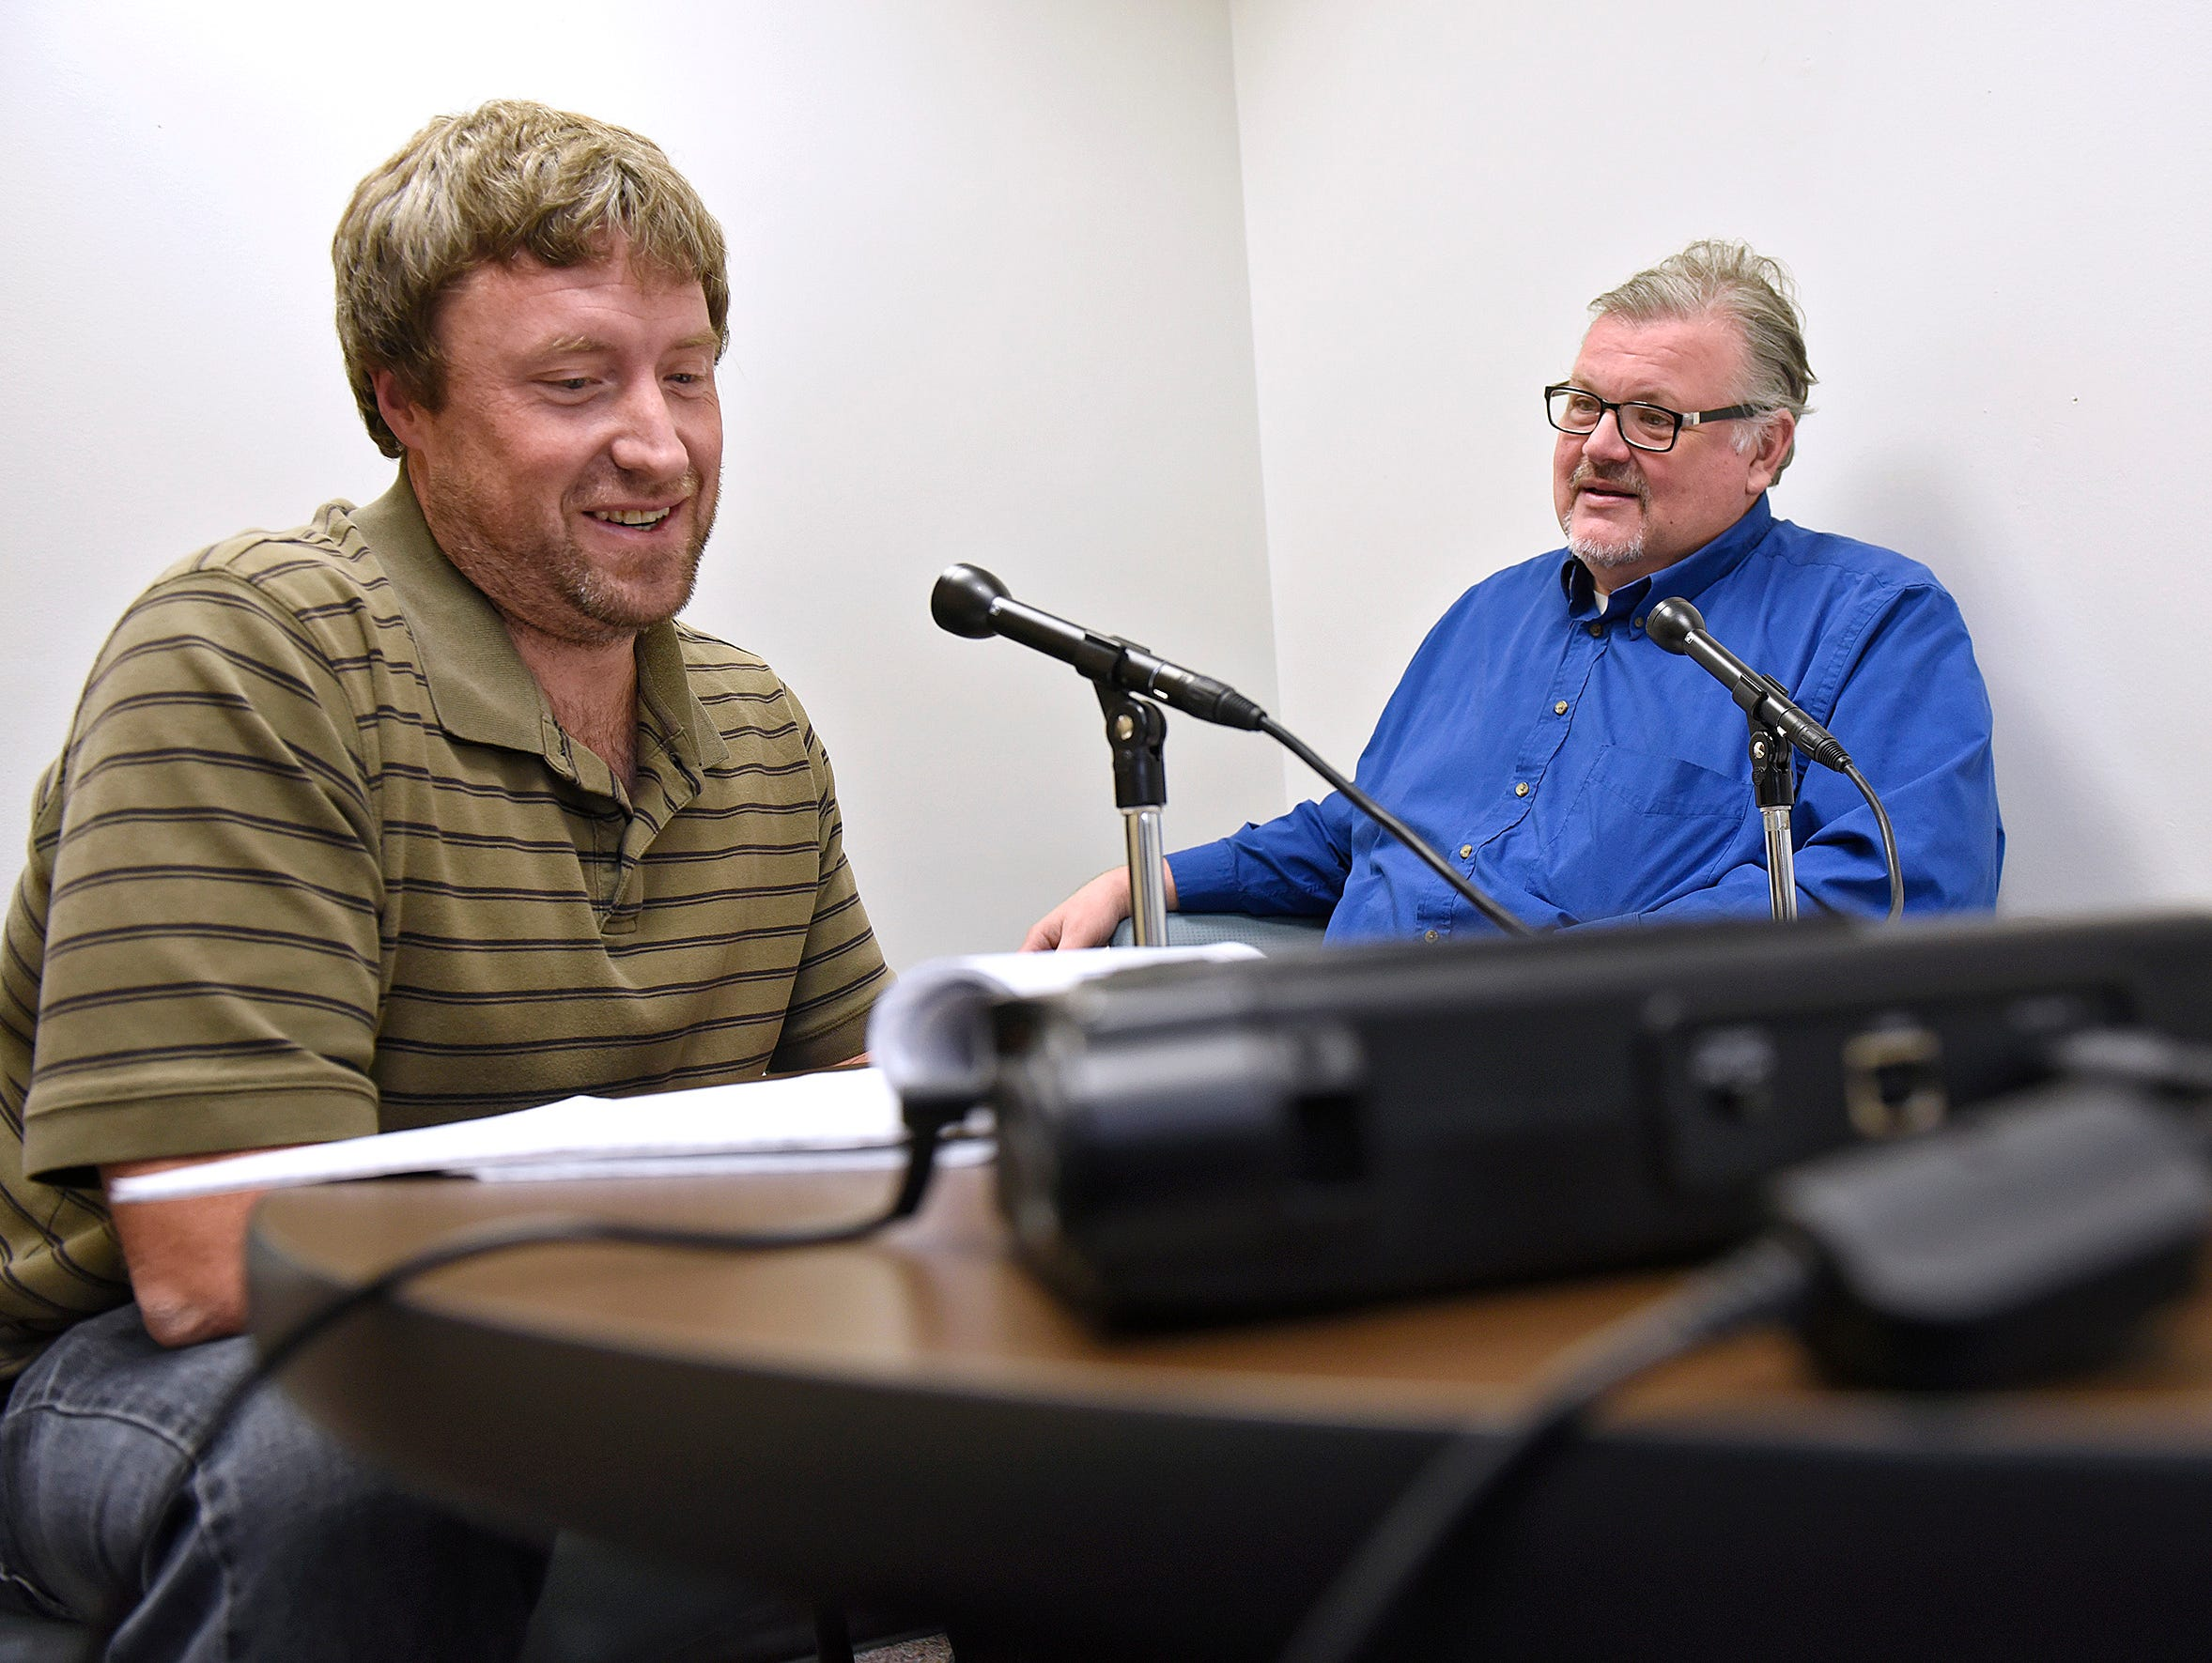 Frank Rajkowski and Tom Elliott record a sports podcast Thursday, Nov. 19.